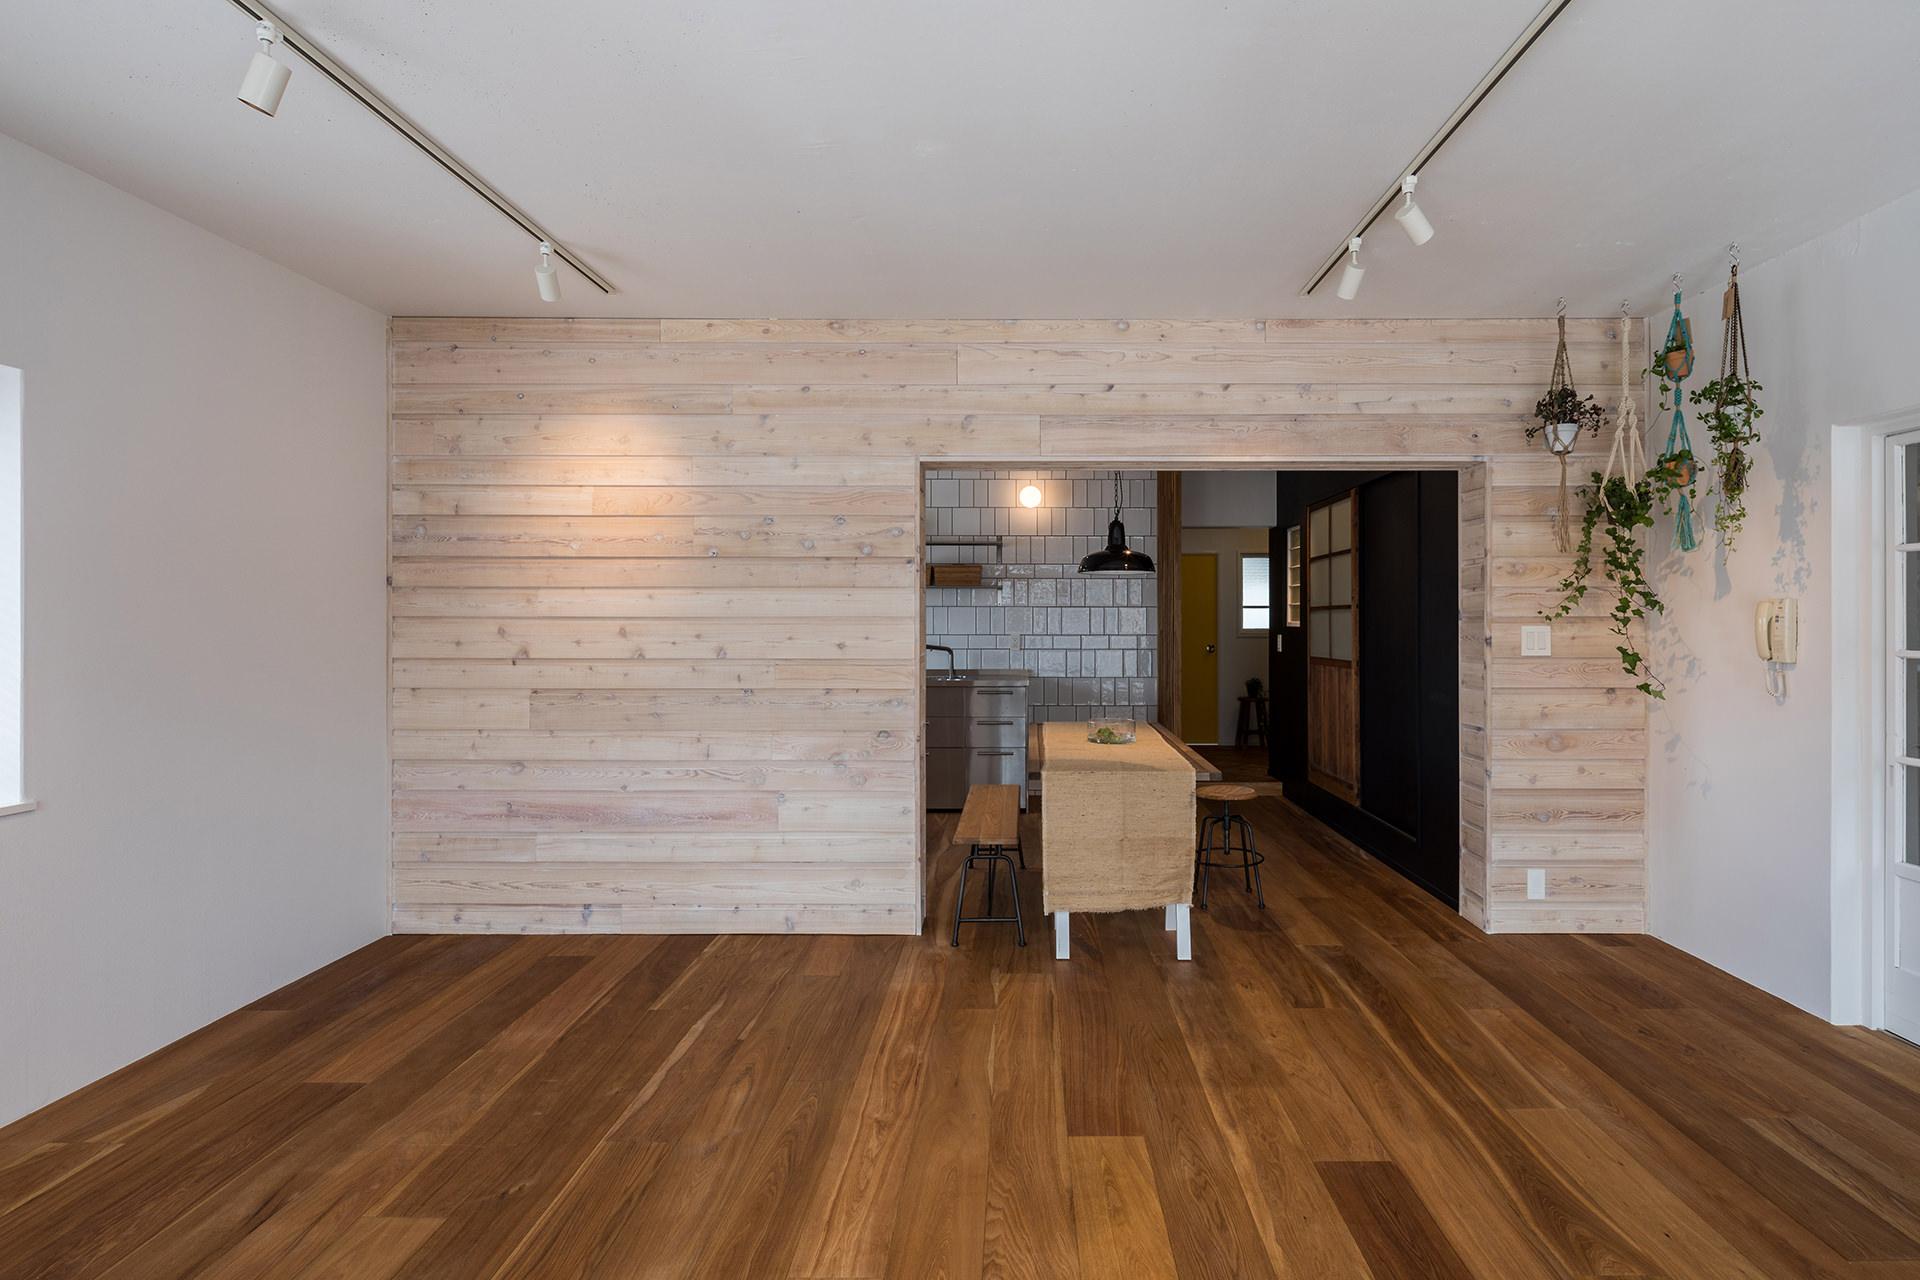 「stri-ep house flat ジュネス葉山一色ガーデン」  イメージ08 撮影:東涌宏和